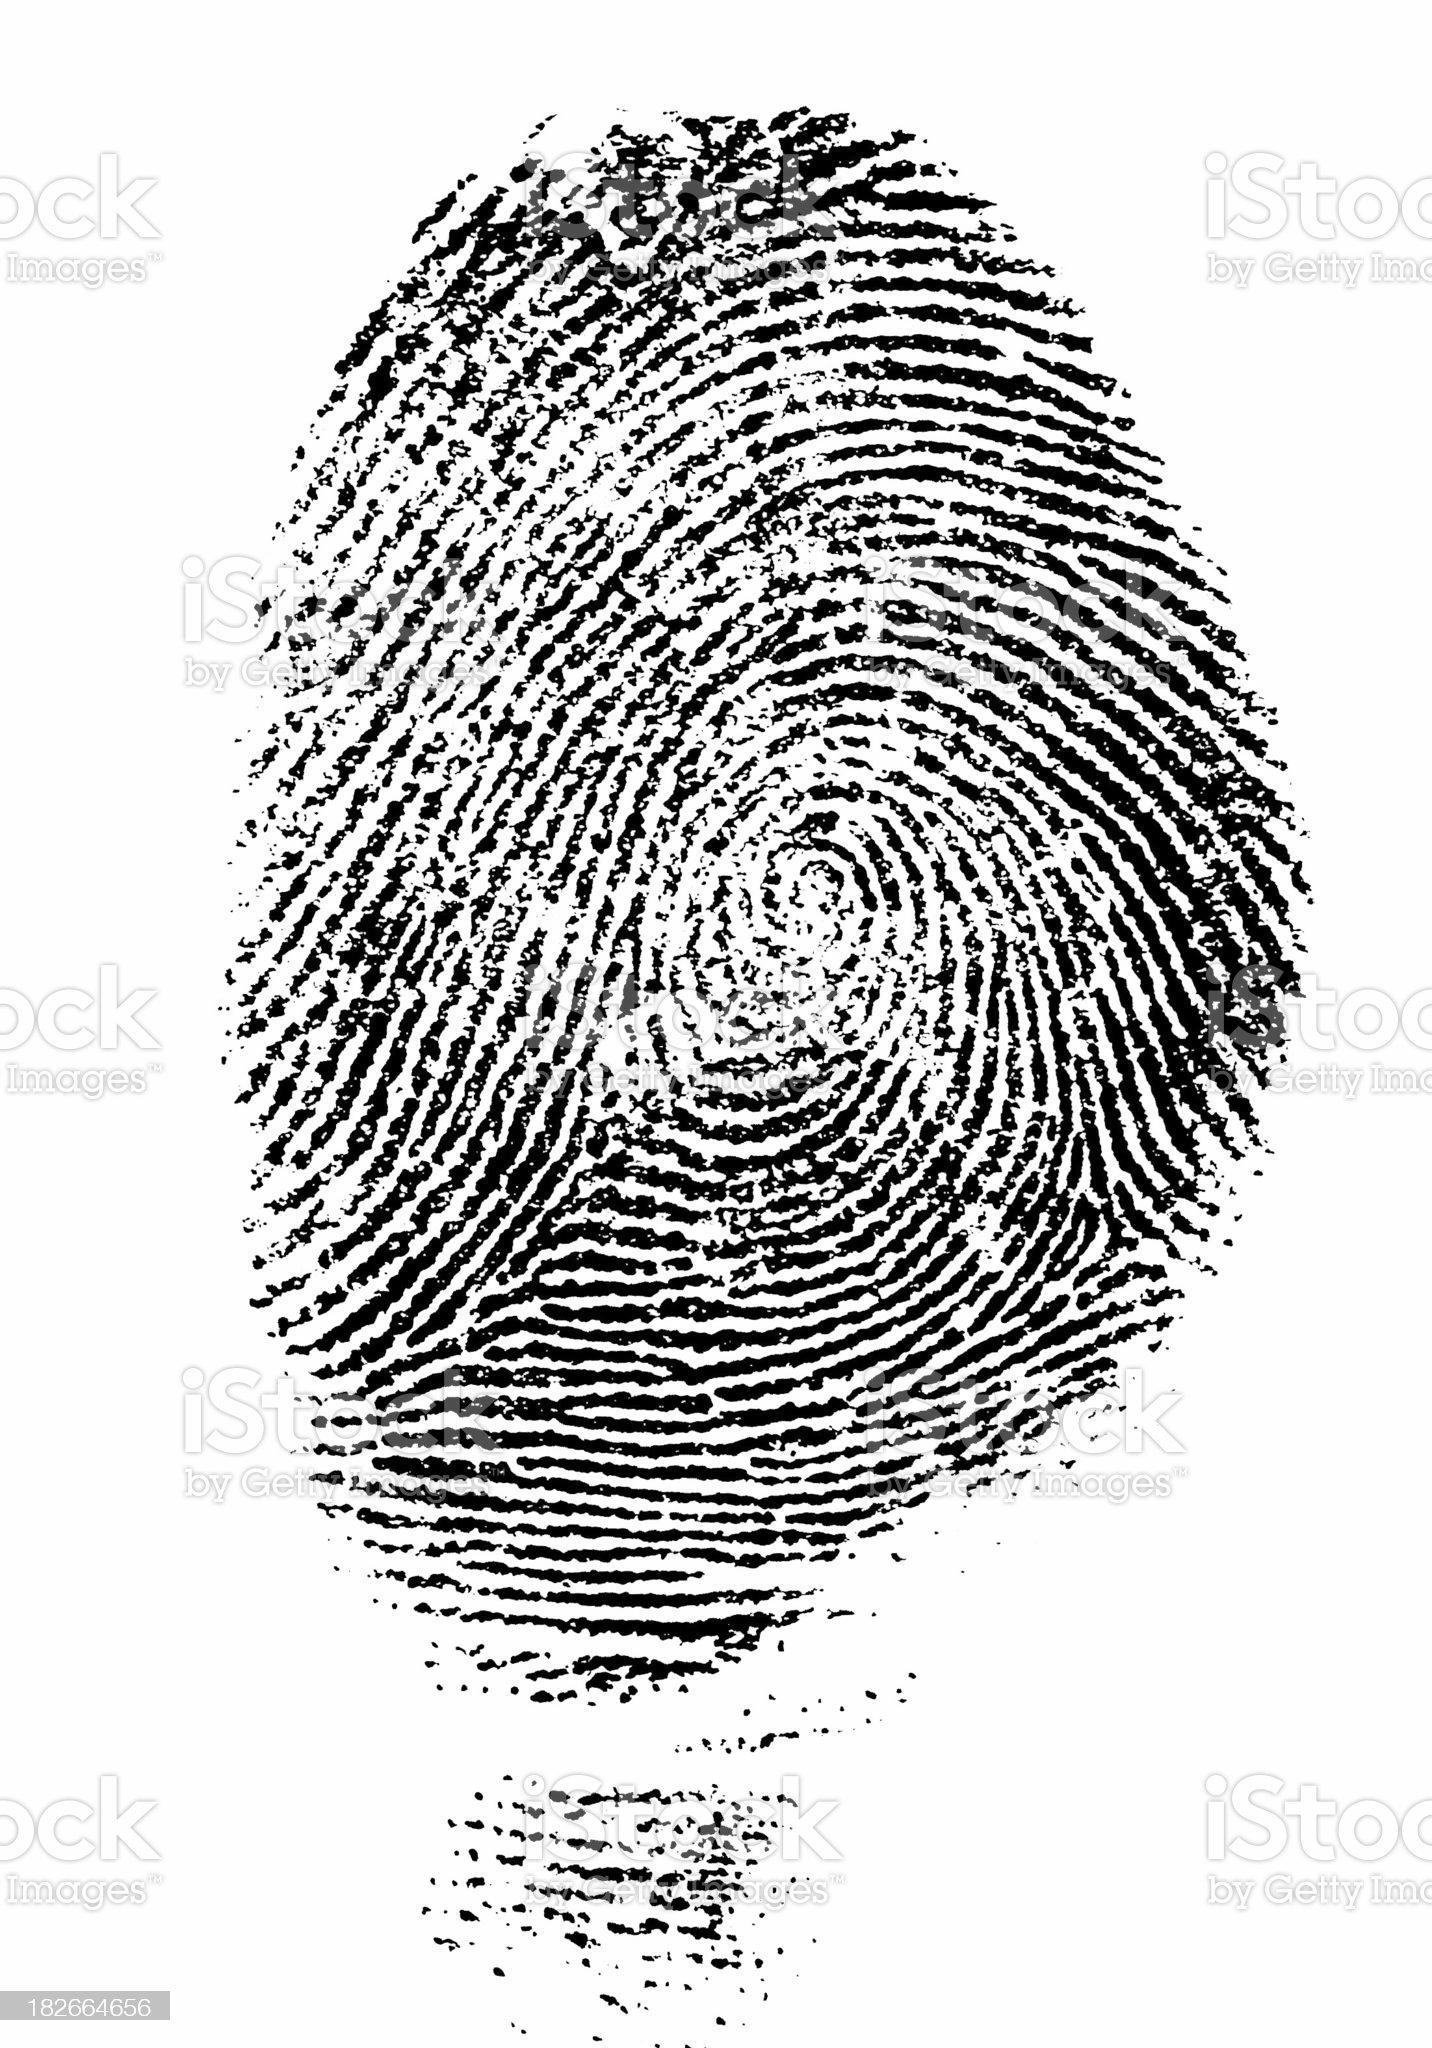 Black Fingerprint - Hi Res royalty-free stock photo